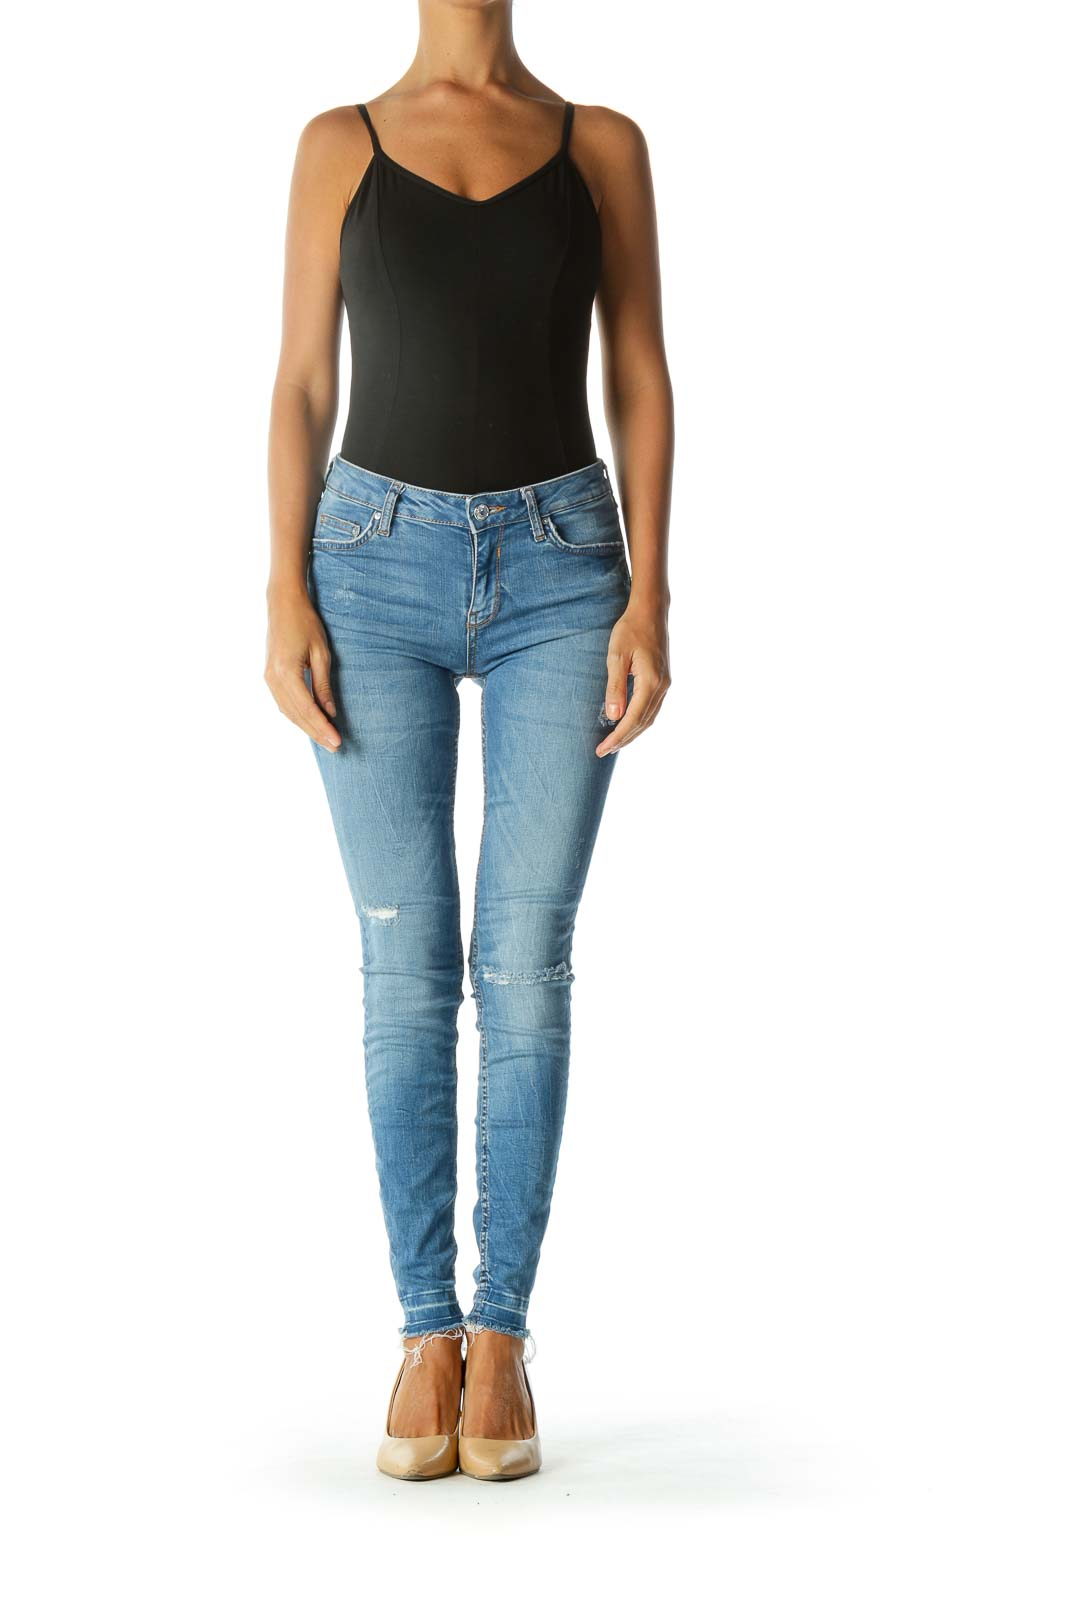 Blue Light-Wash Distressed Skinny Jeans with Frayed Hem